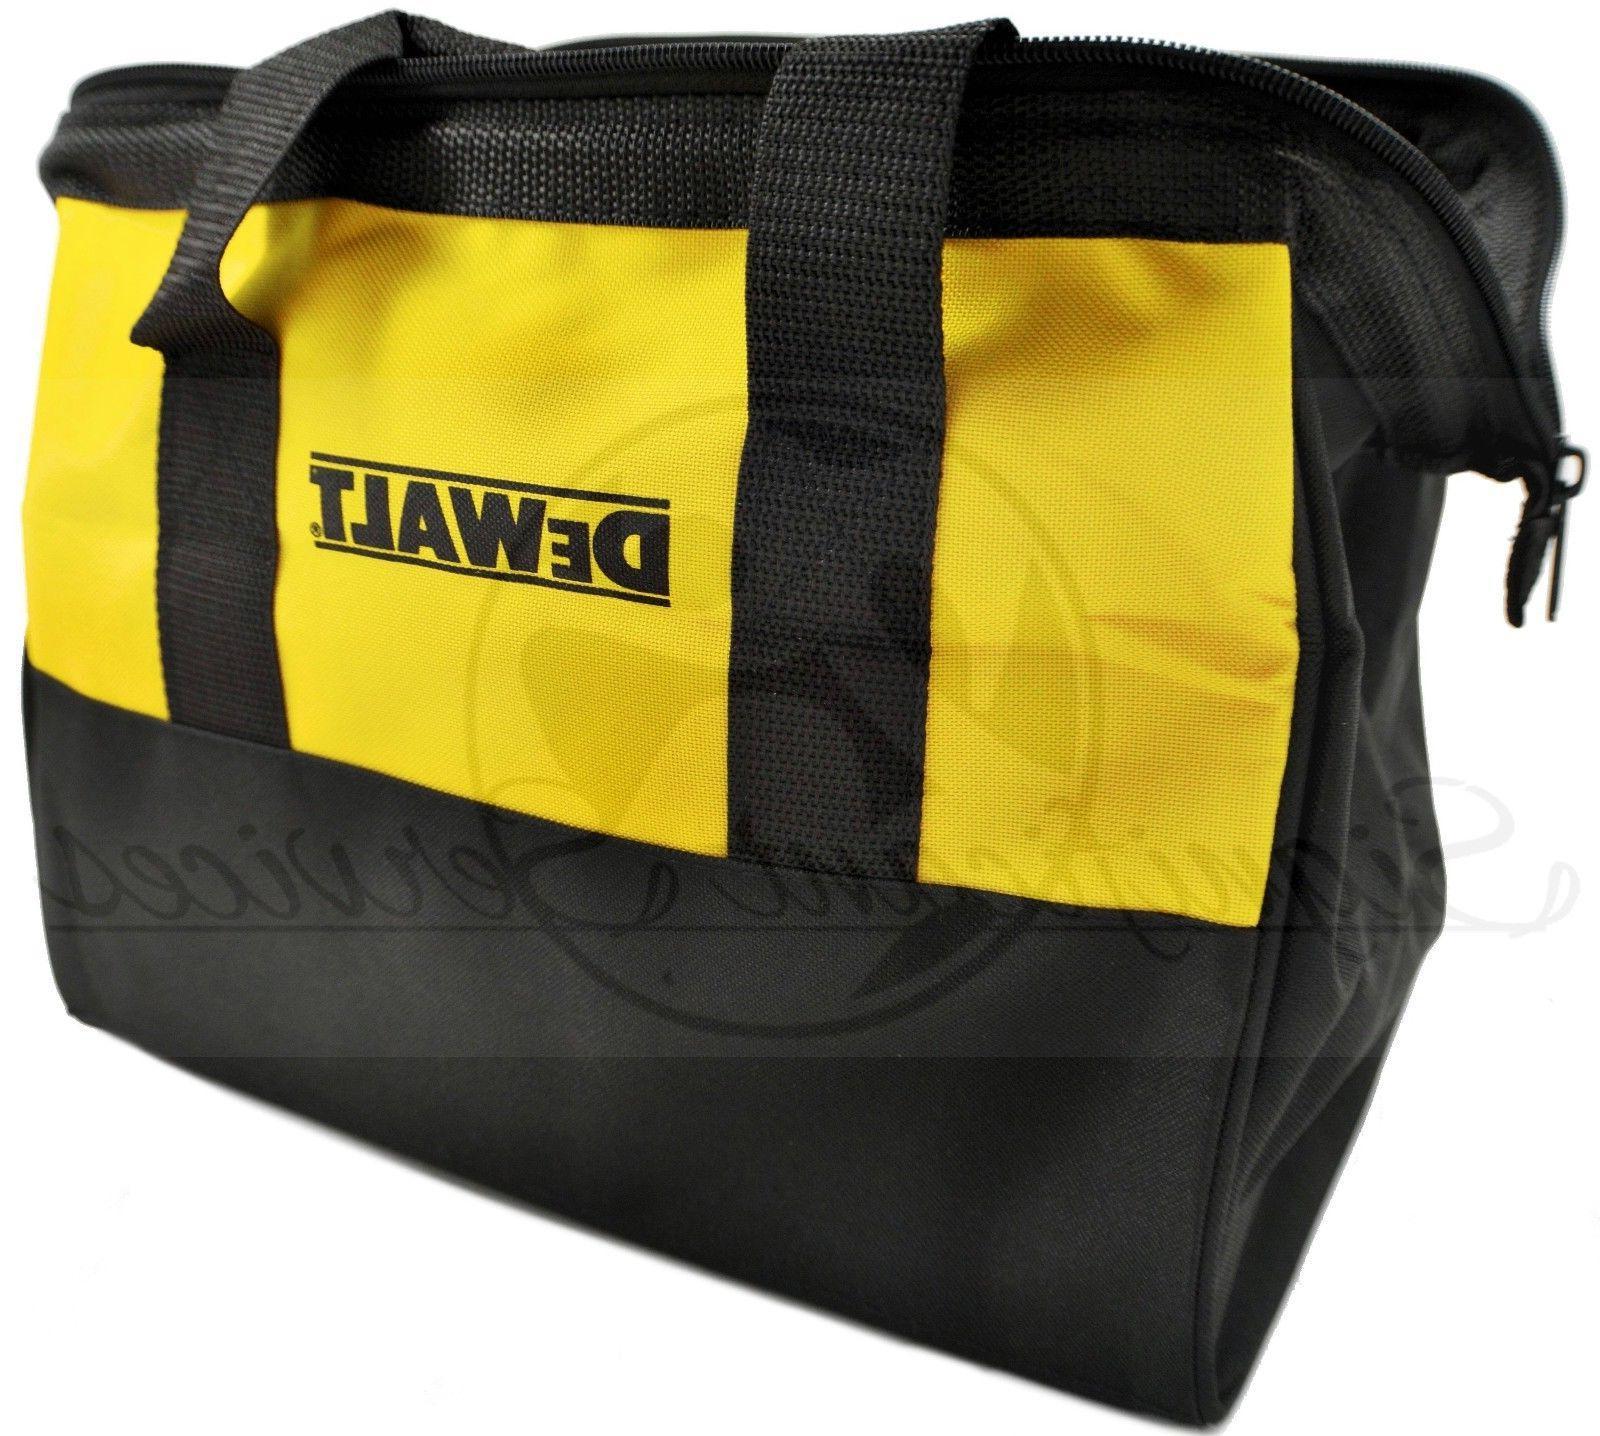 "NEW 13"" Duty Tool Bag 6 N037466"